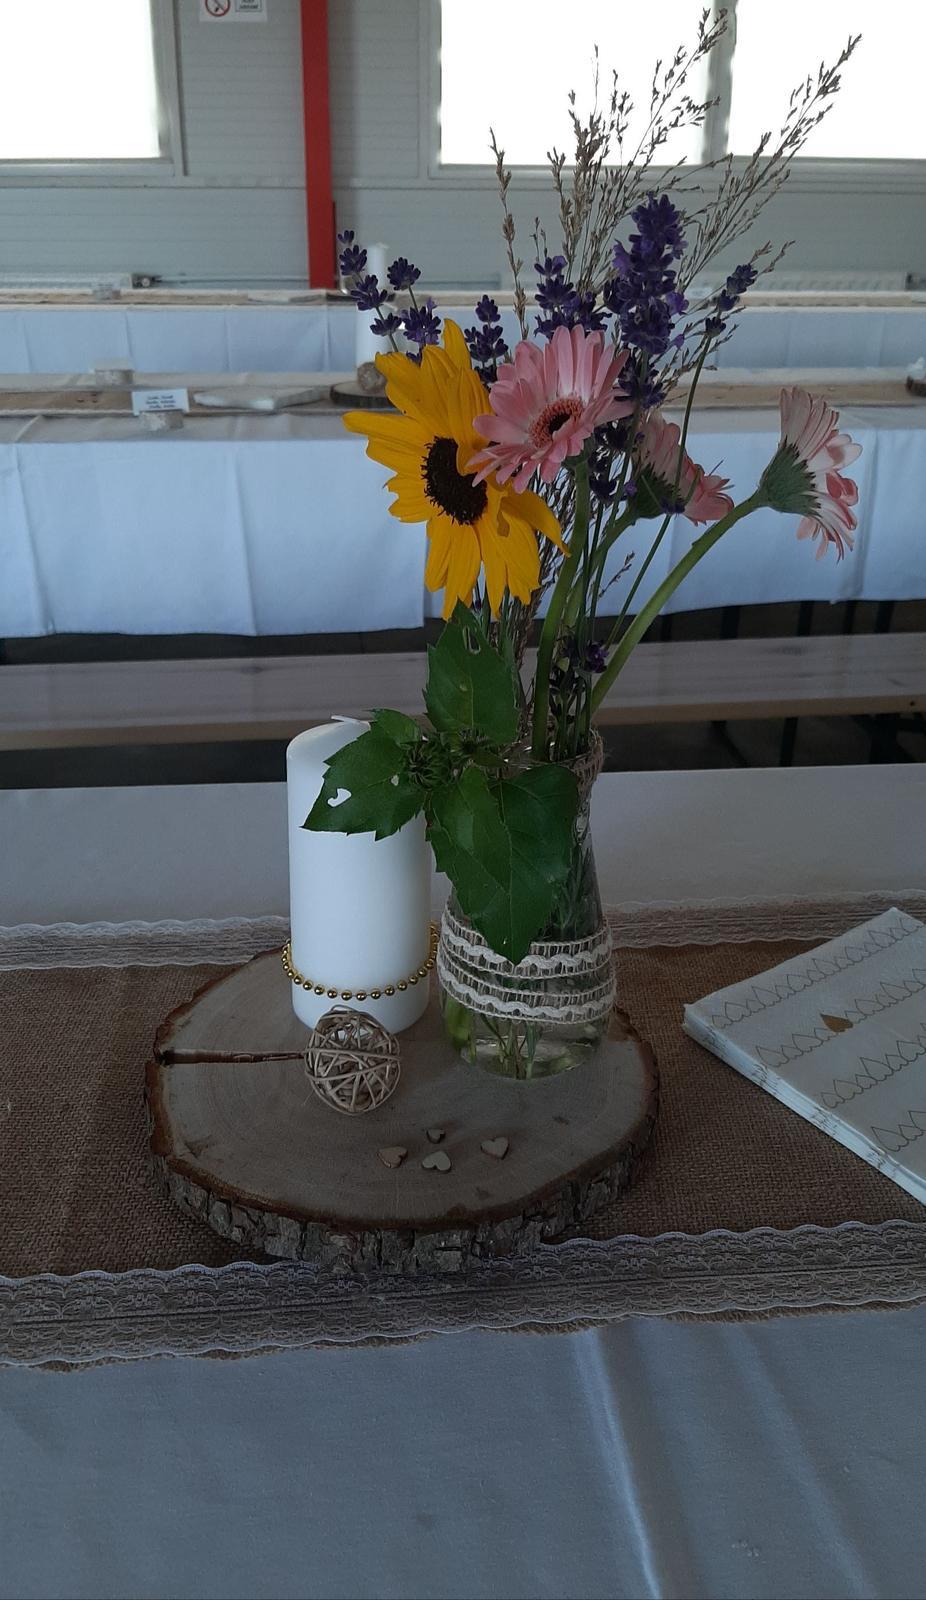 Svadobne dekoracie na stol vintage - Obrázok č. 1